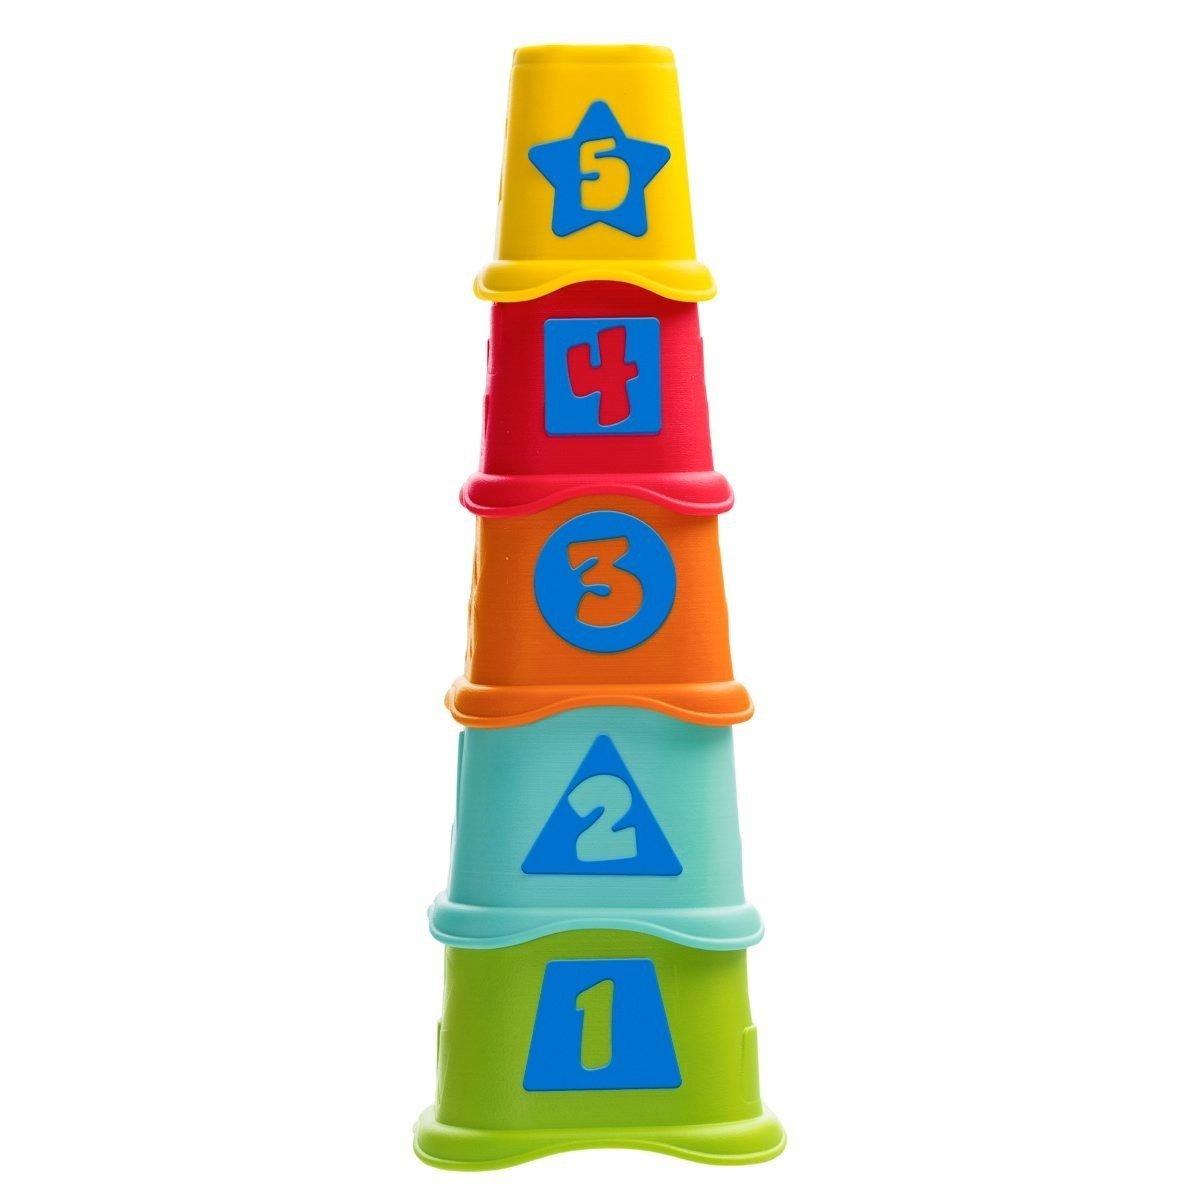 Pyramida stohovac� kel�mky 5 ks 2v1